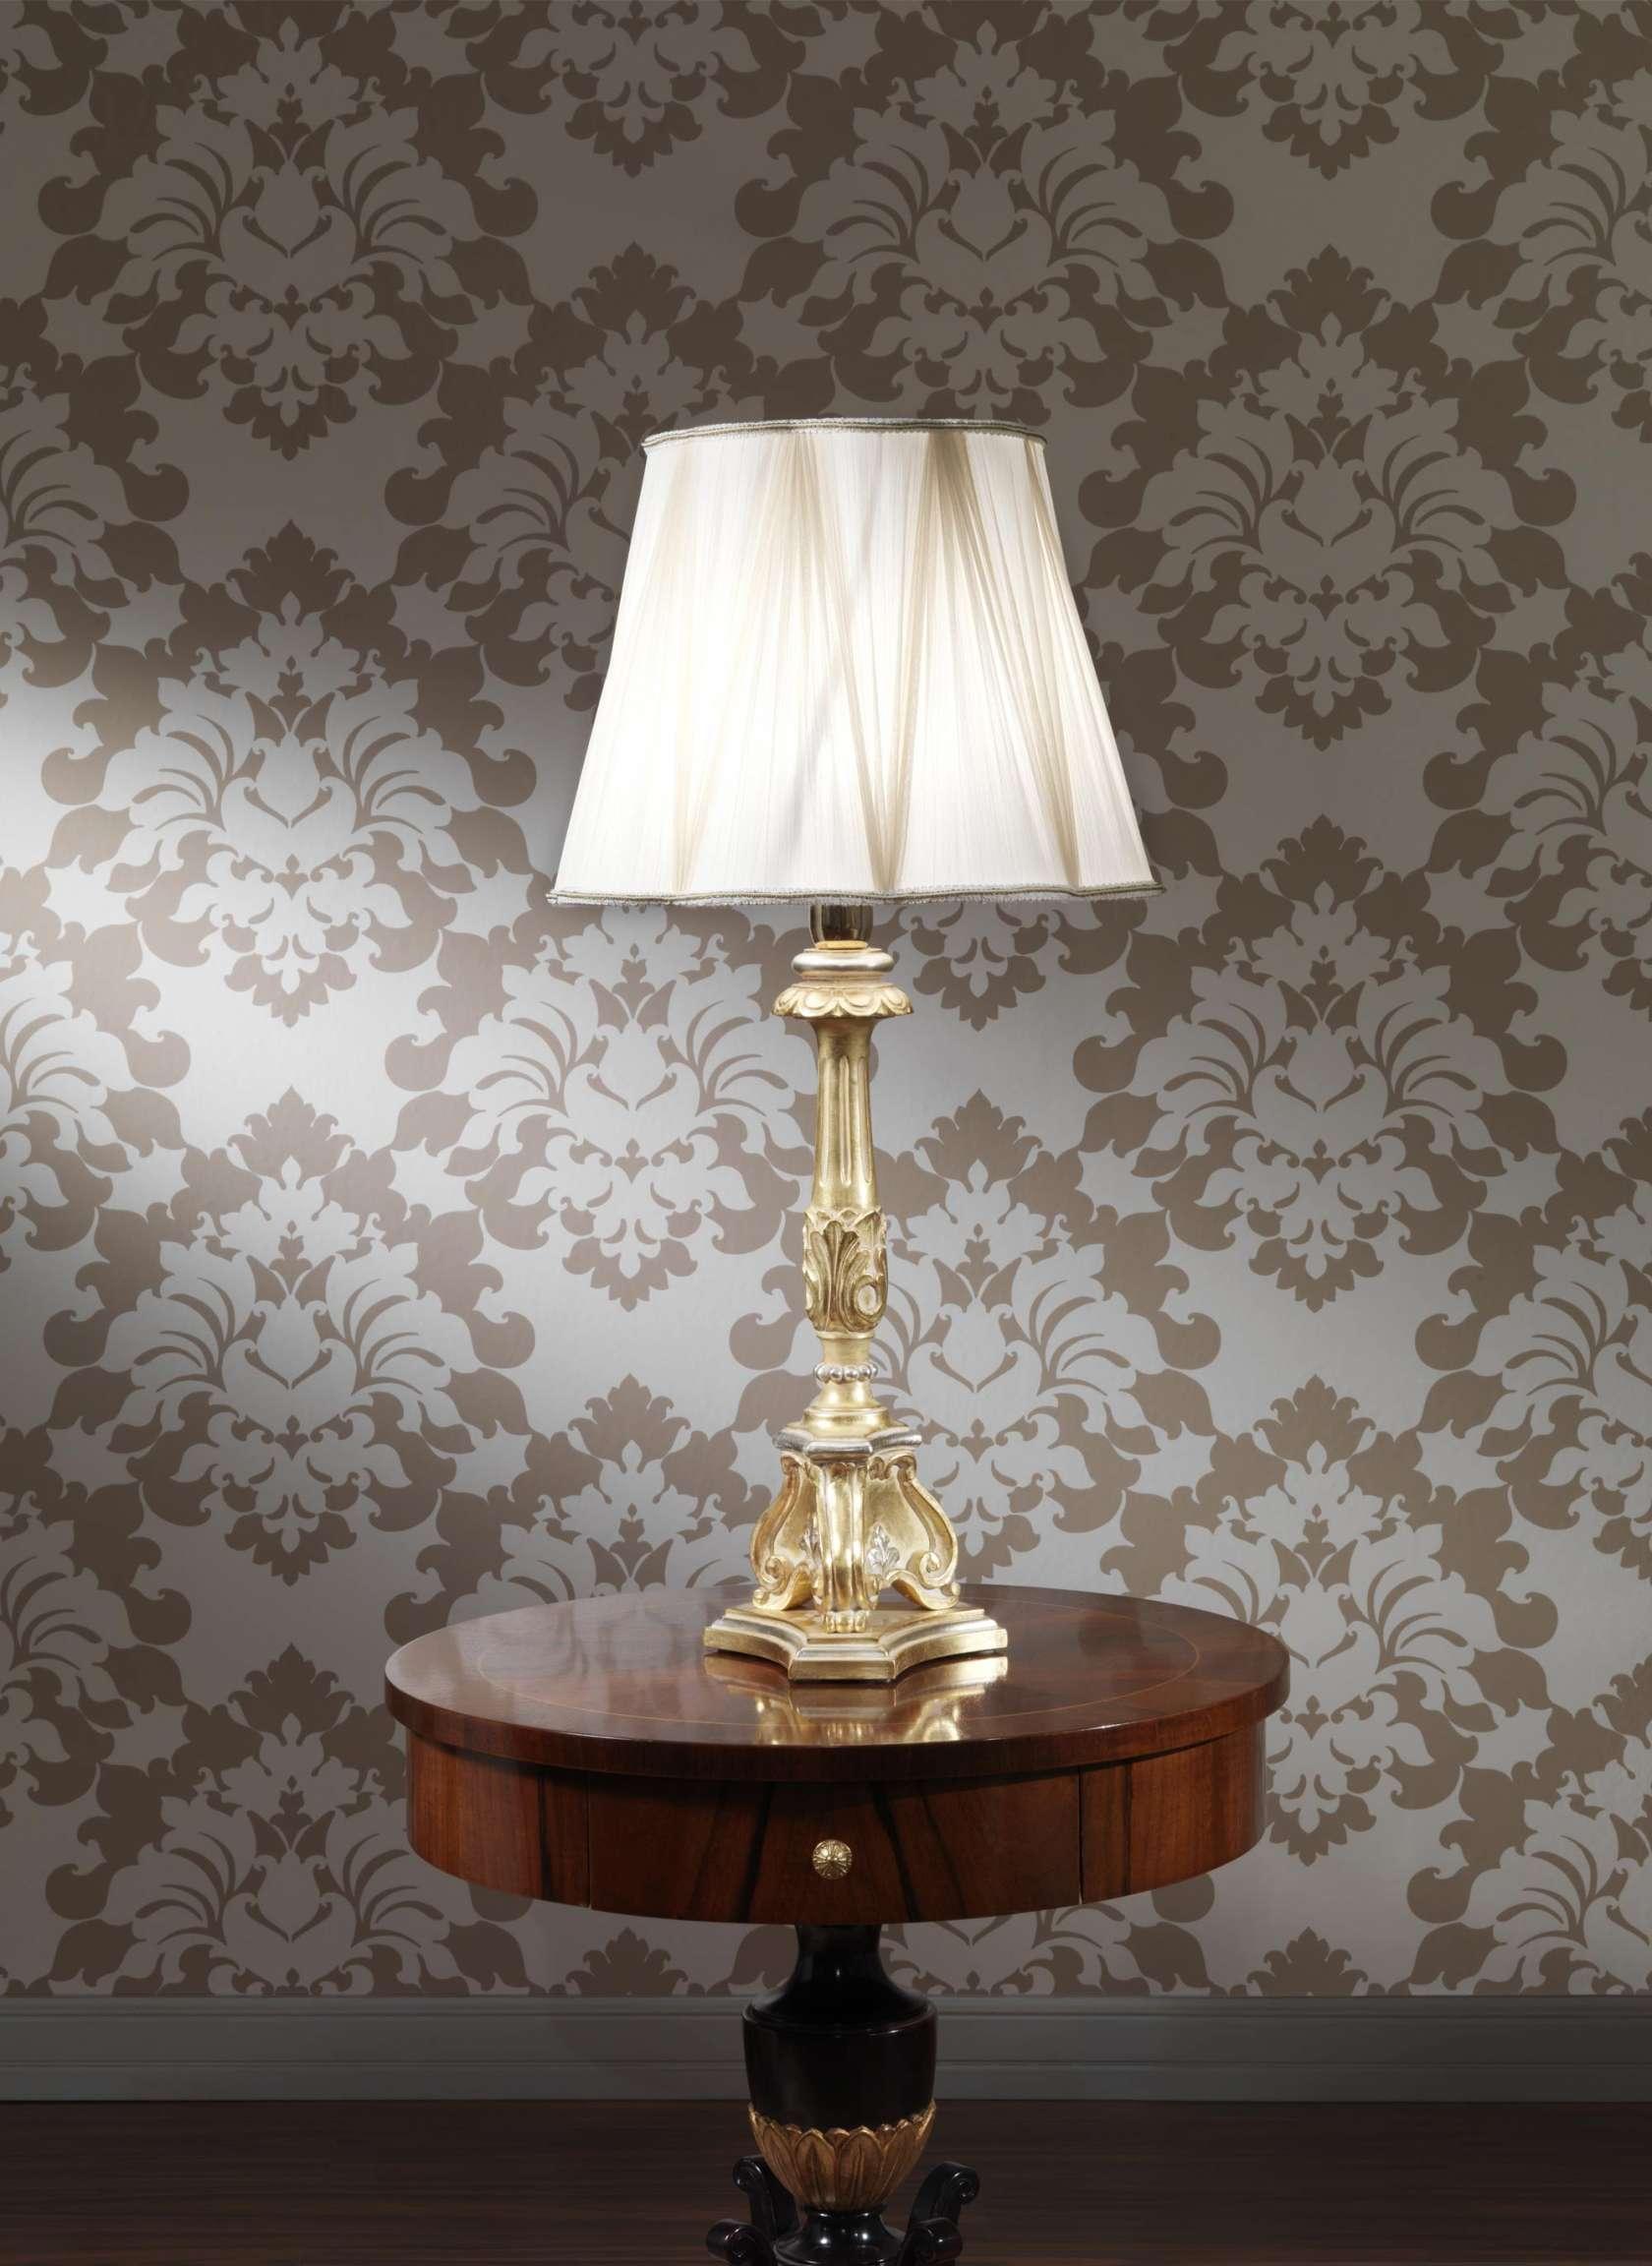 Настольная классическая лампа с белым абажуром